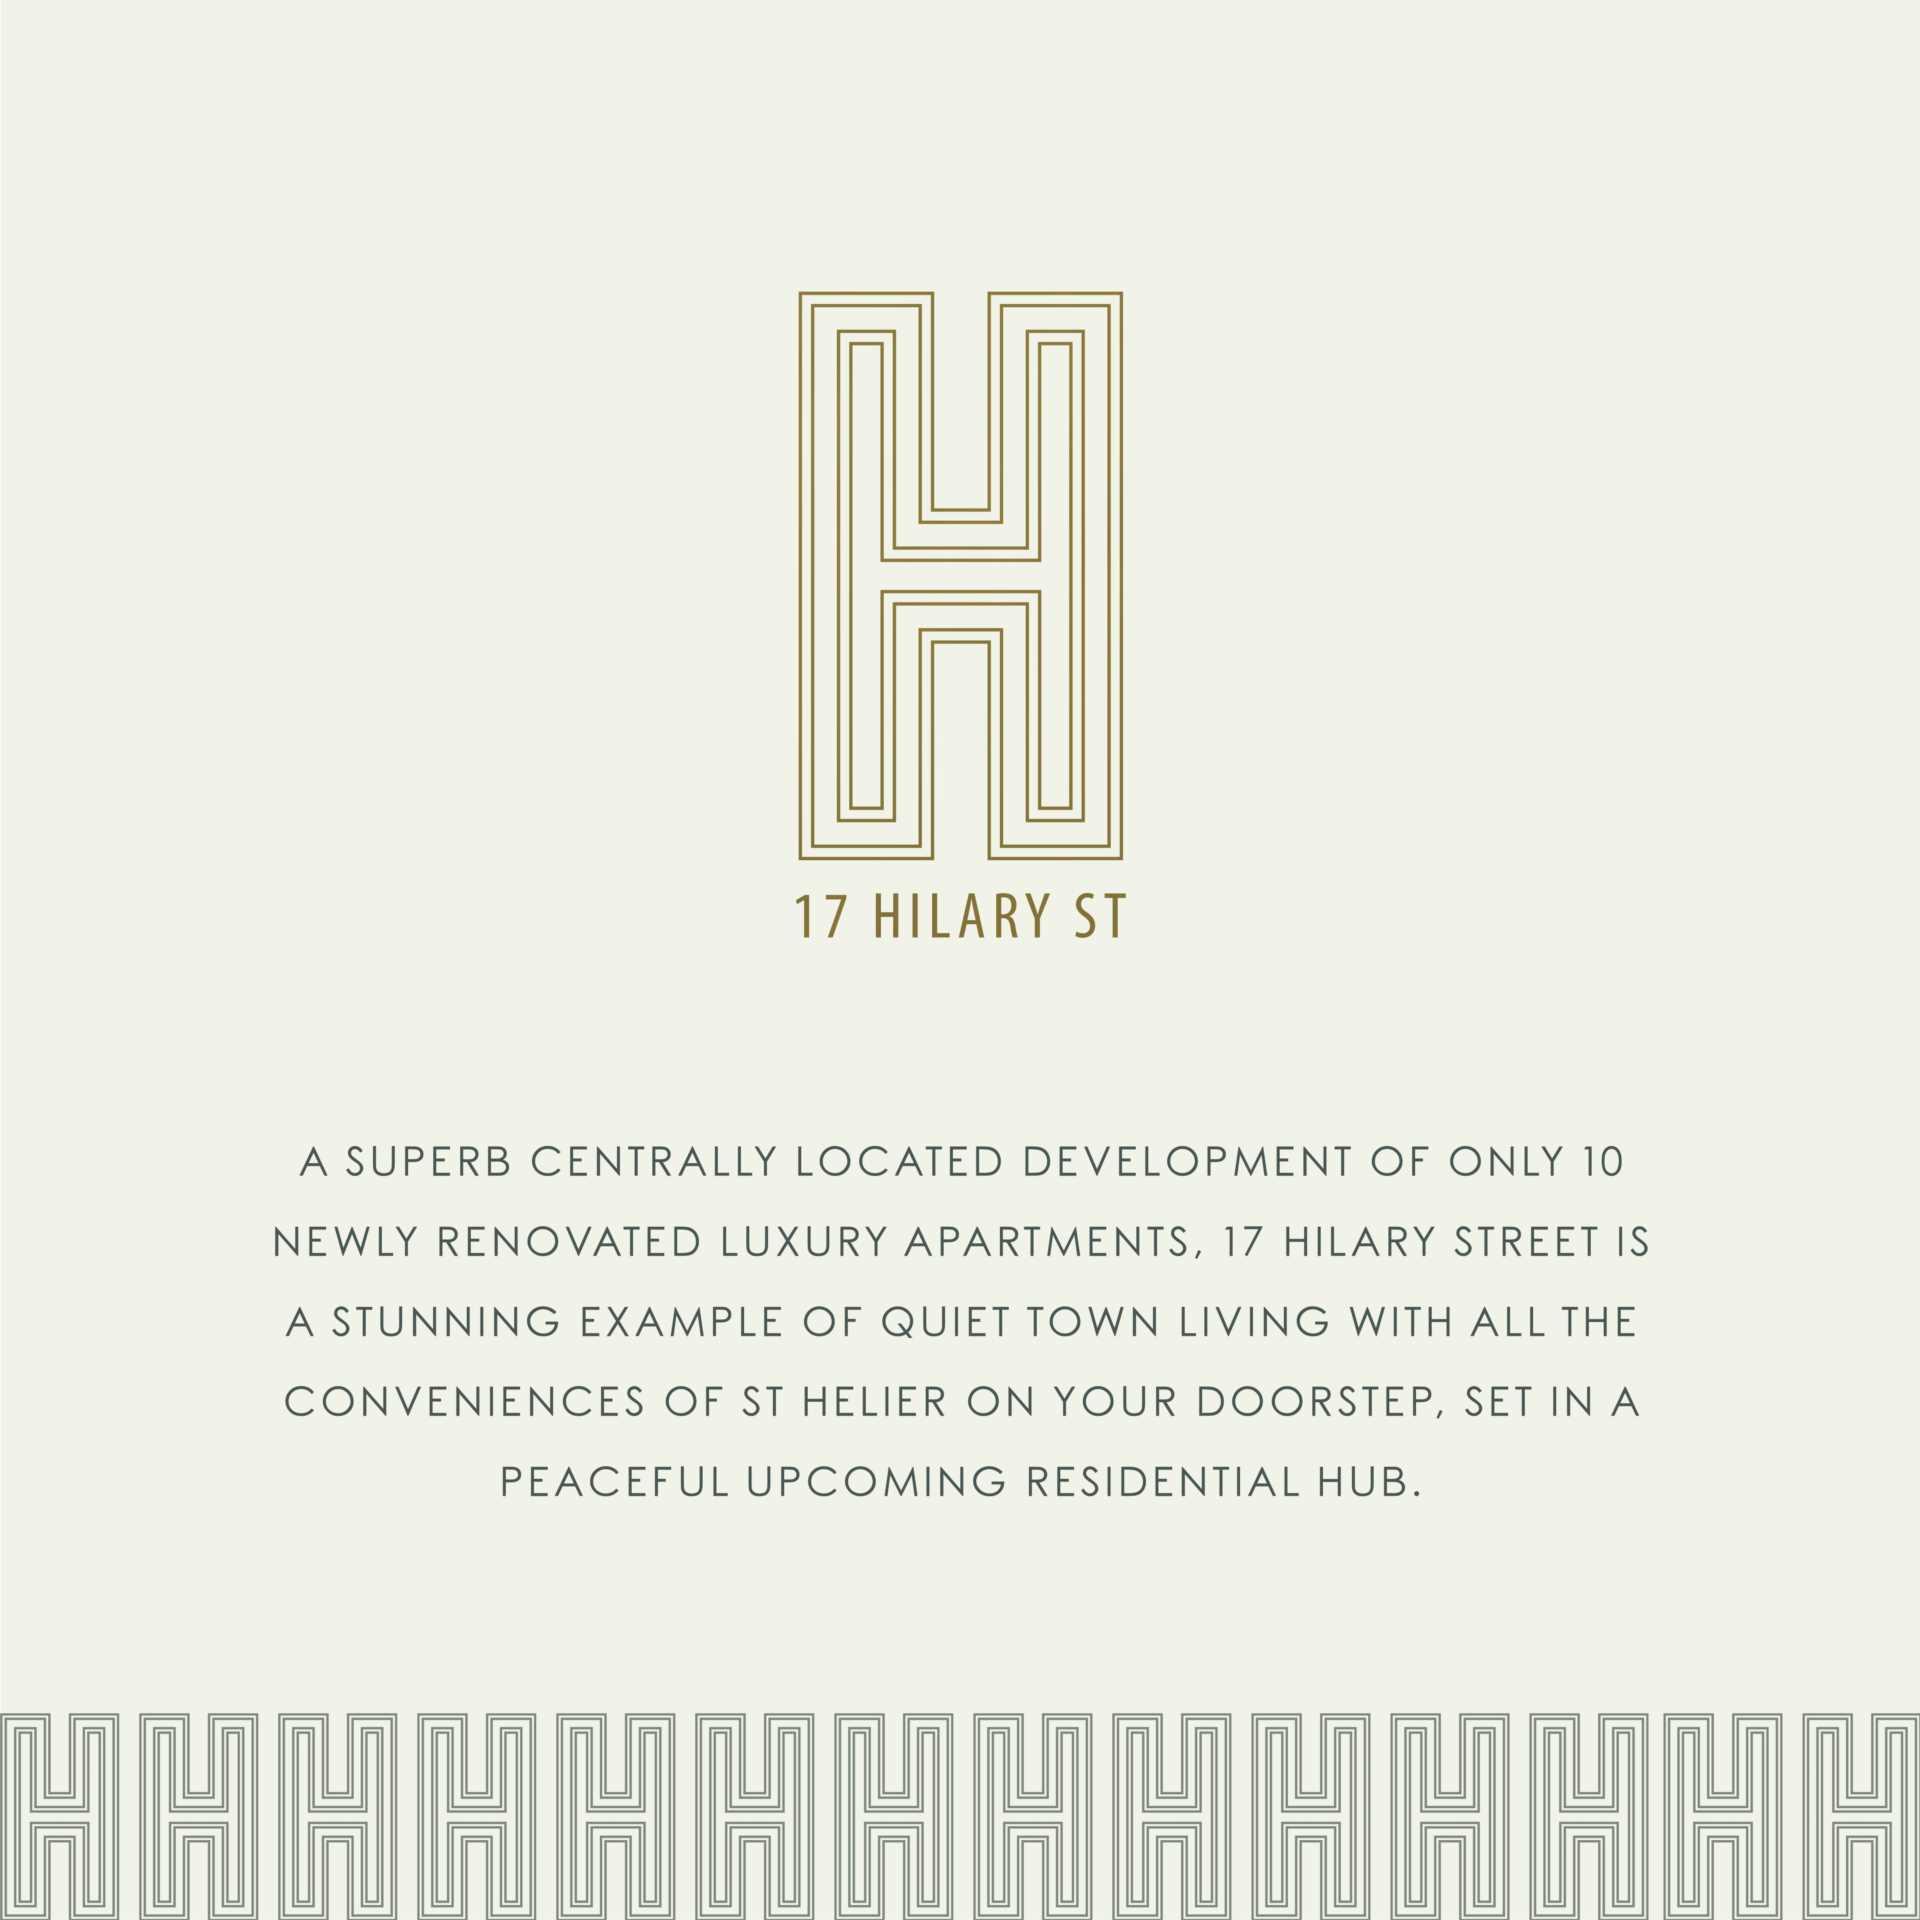 Flat 2, 17 Hilary Street, Image 3